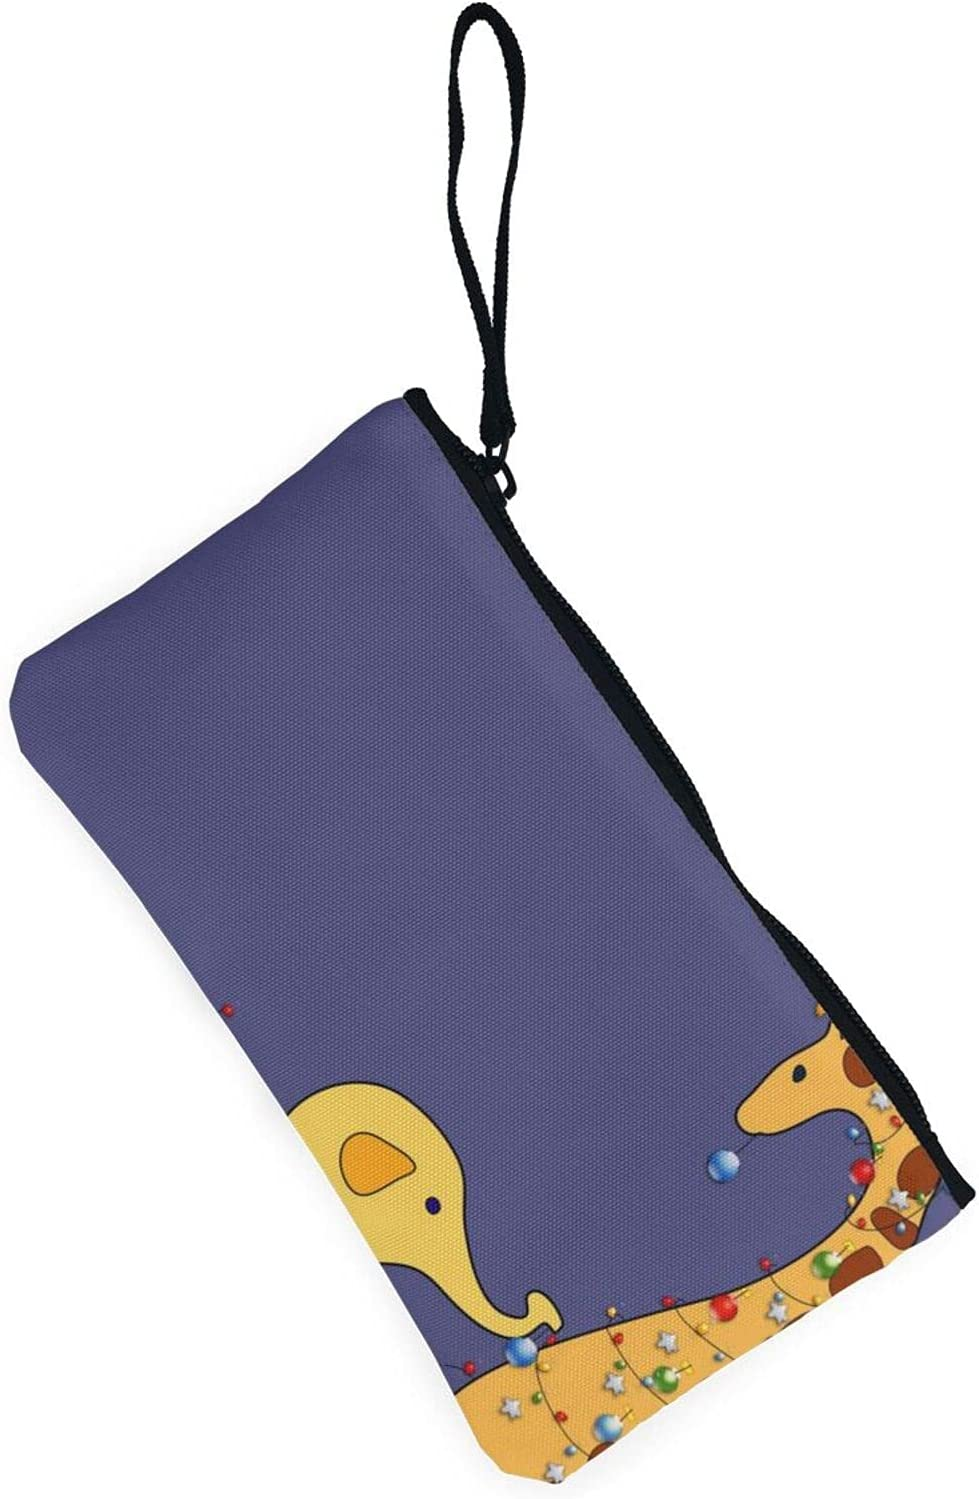 AORRUAM Elephant and giraffe Canvas Coin Purse,Canvas Zipper Pencil Cases,Canvas Change Purse Pouch Mini Wallet Coin Bag